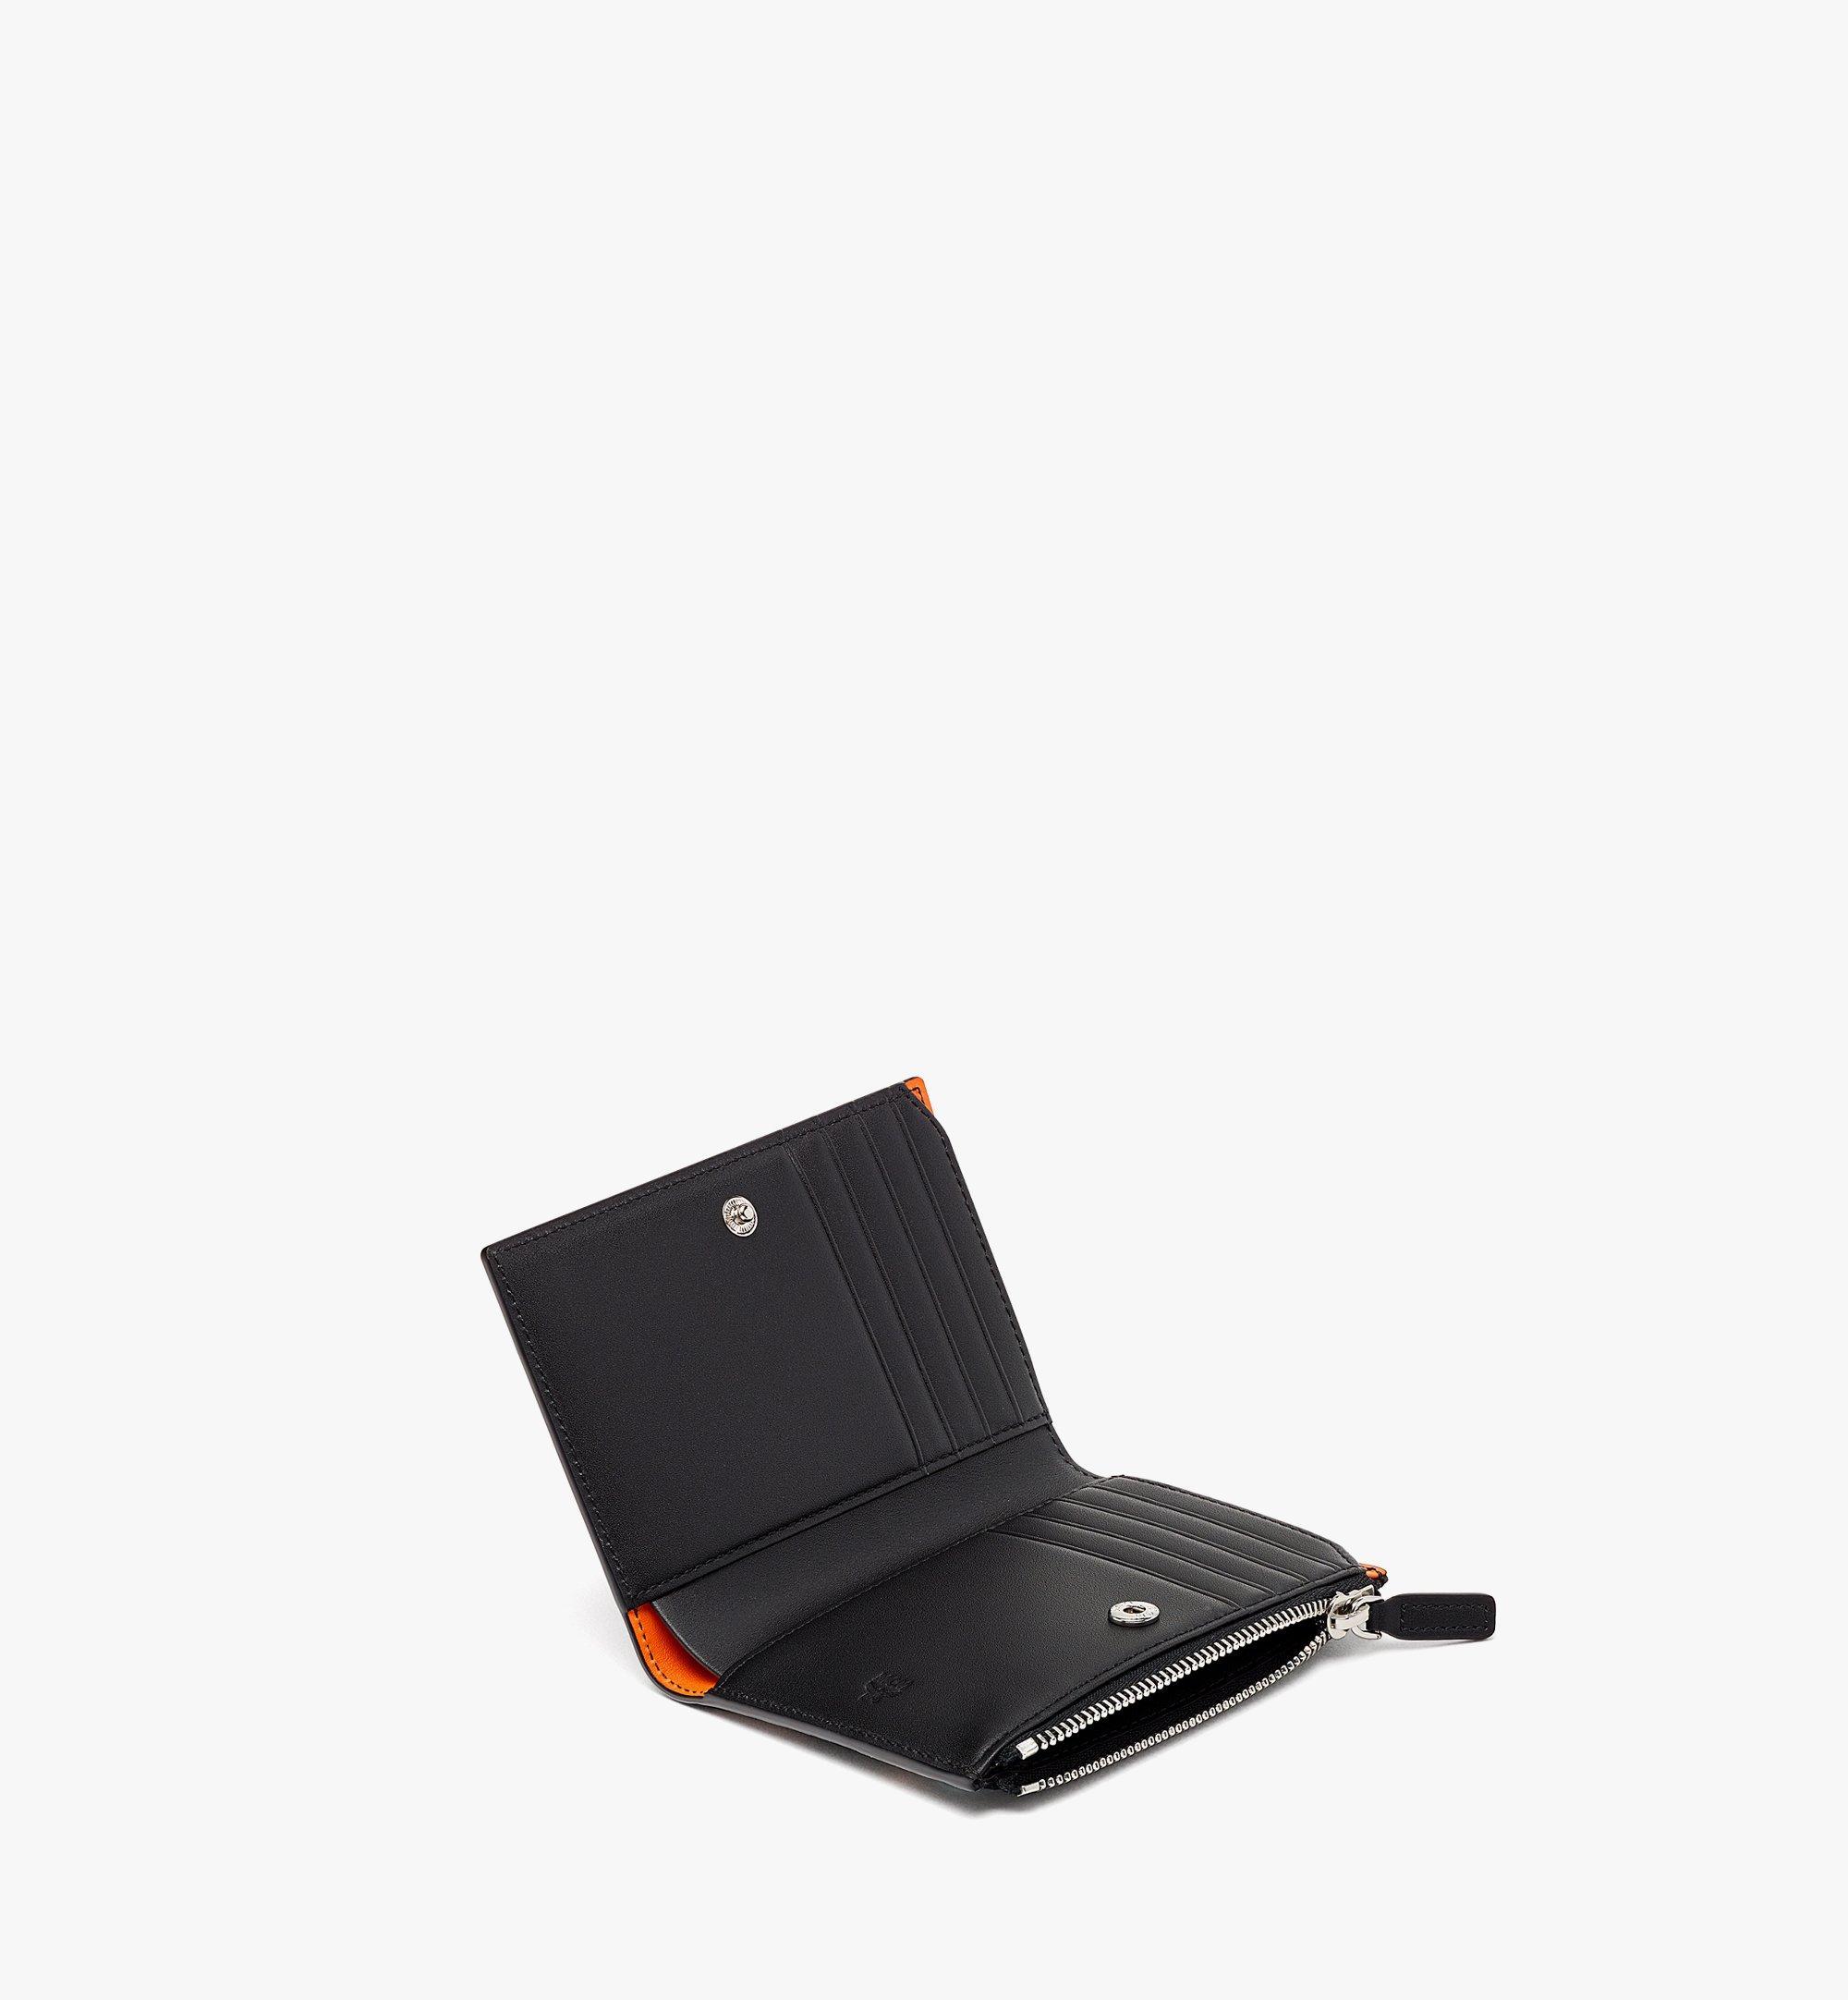 MCM 二つ折りカードウォレット - カラースプラッシュ ヴィセトス Orange MXSBASX02O9001 ほかの角度から見る 1